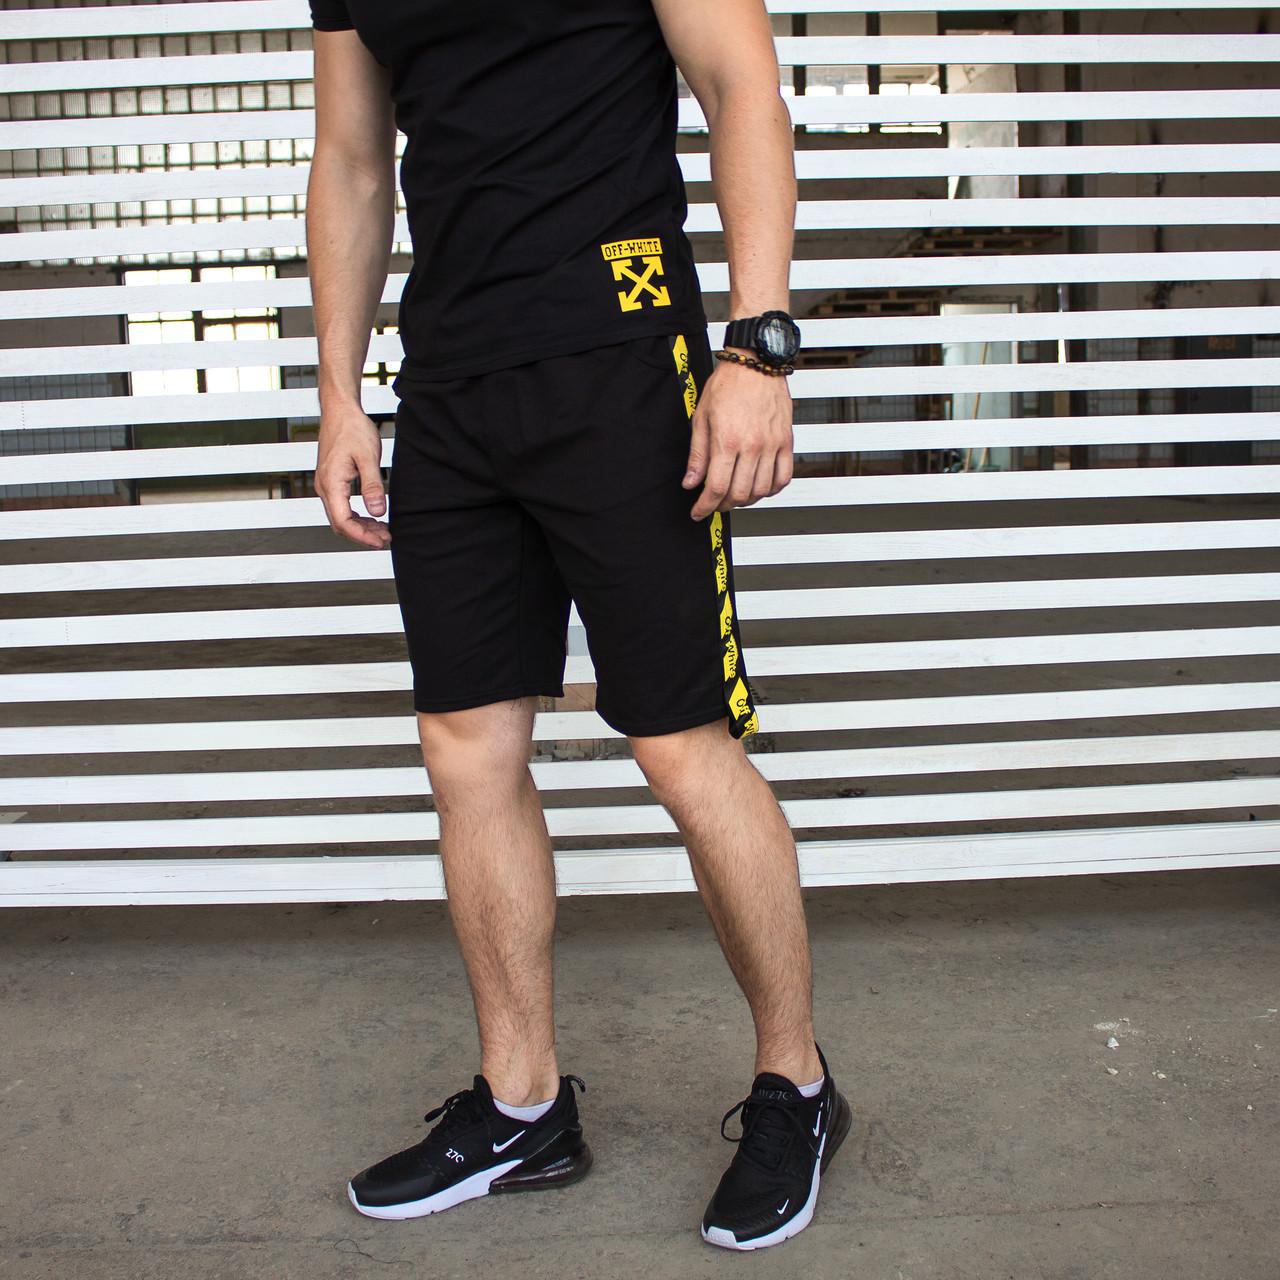 Шорты мужские черные бренд Off-White размер M, L, XL, XXL